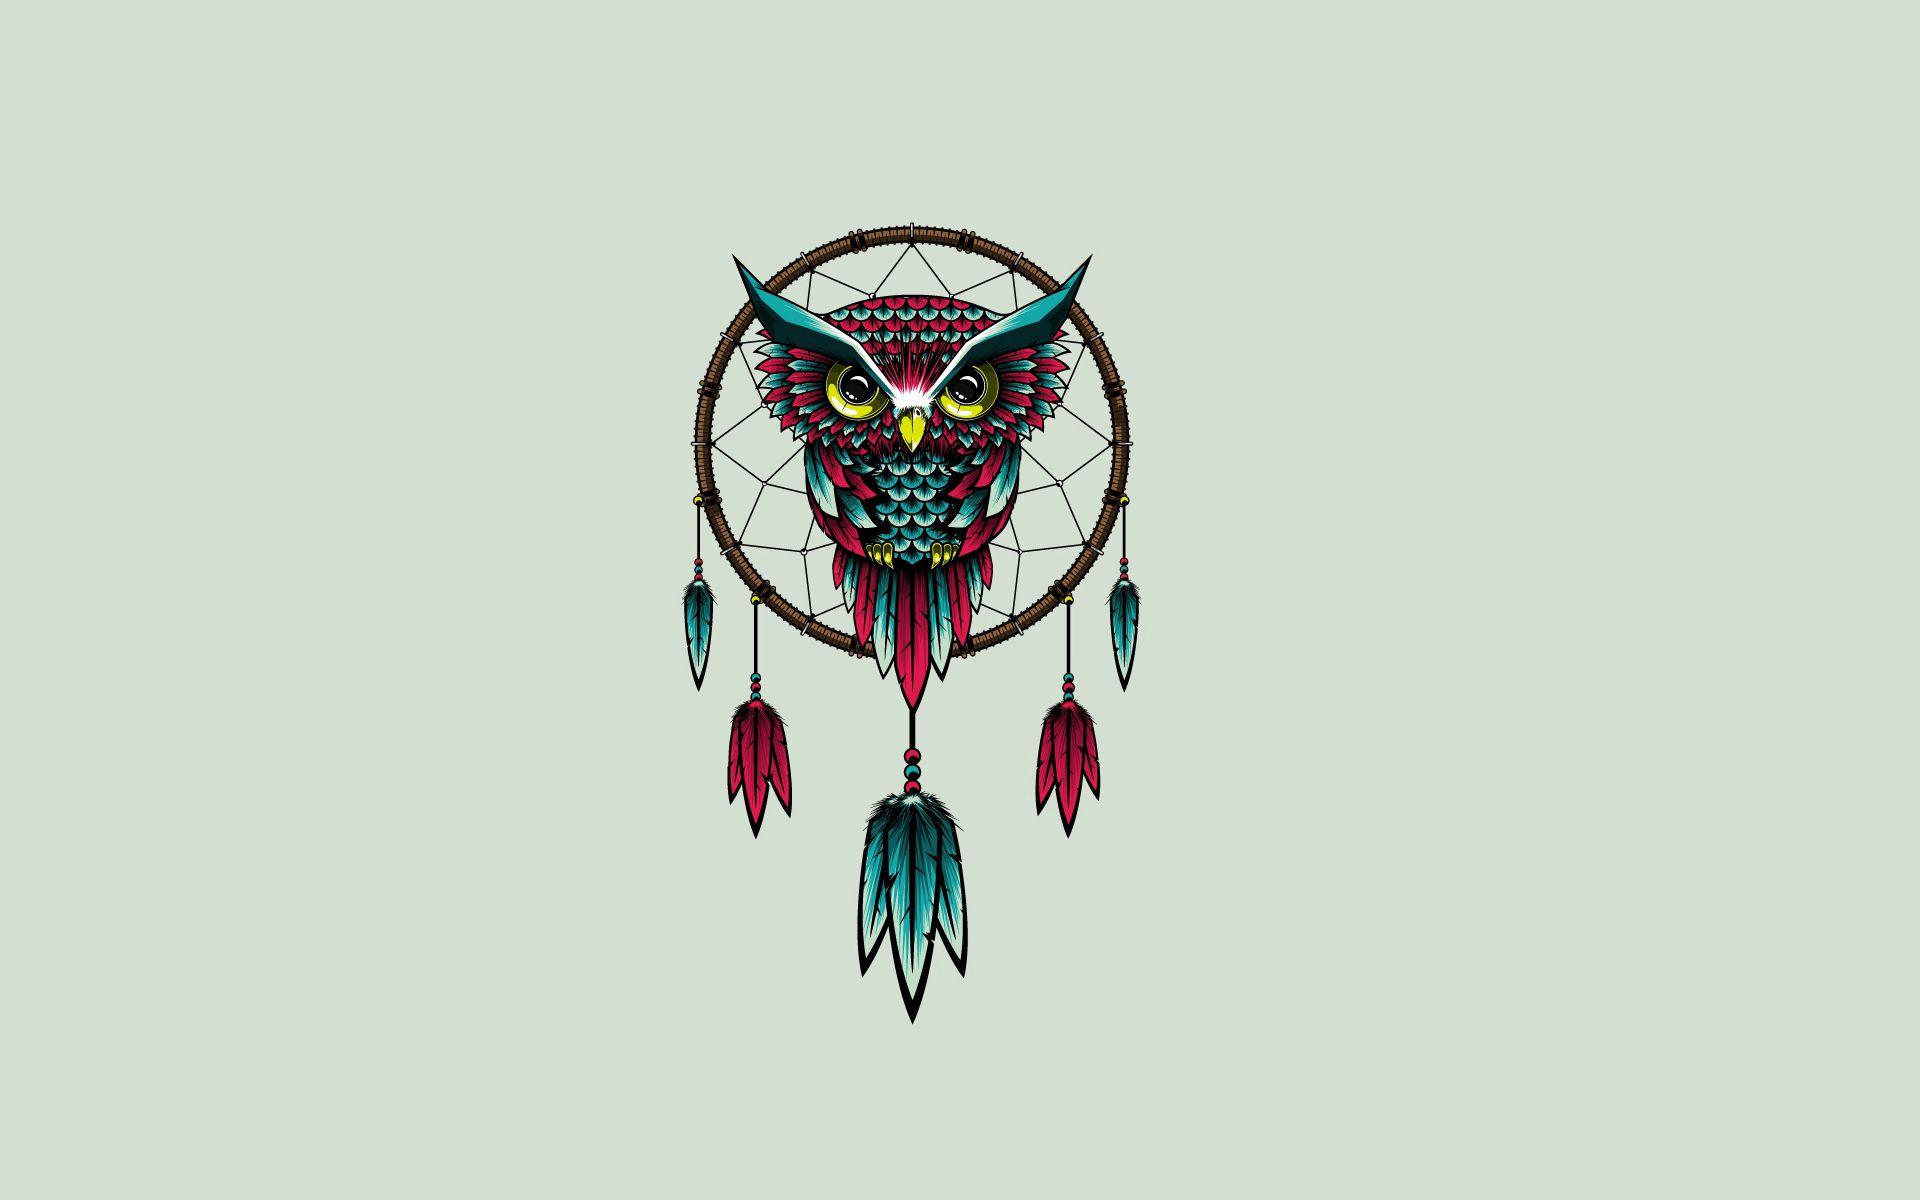 56308 Screensavers and Wallpapers Bird for phone. Download Art, Owl, Vector, Bird, Dream Catcher, Dreamcatcher pictures for free